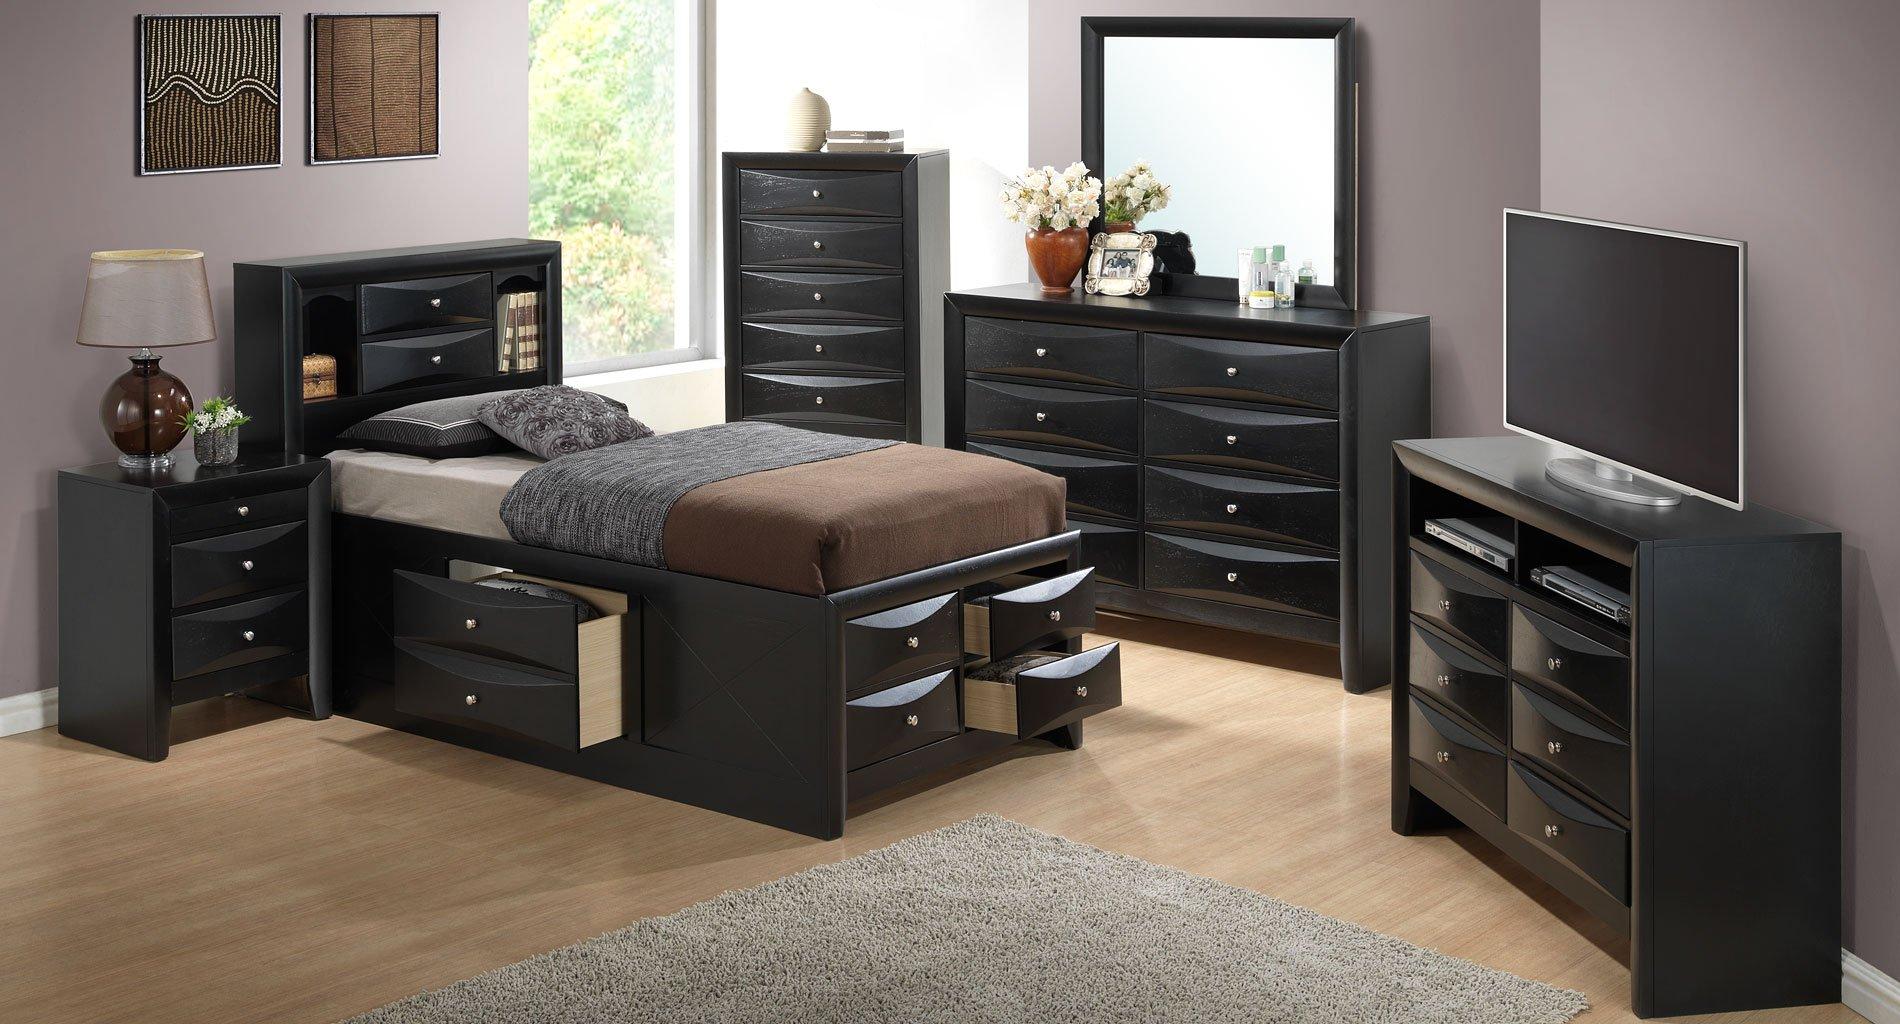 G1500g youth storage bedroom set glory furniture - Youth bedroom furniture with storage ...